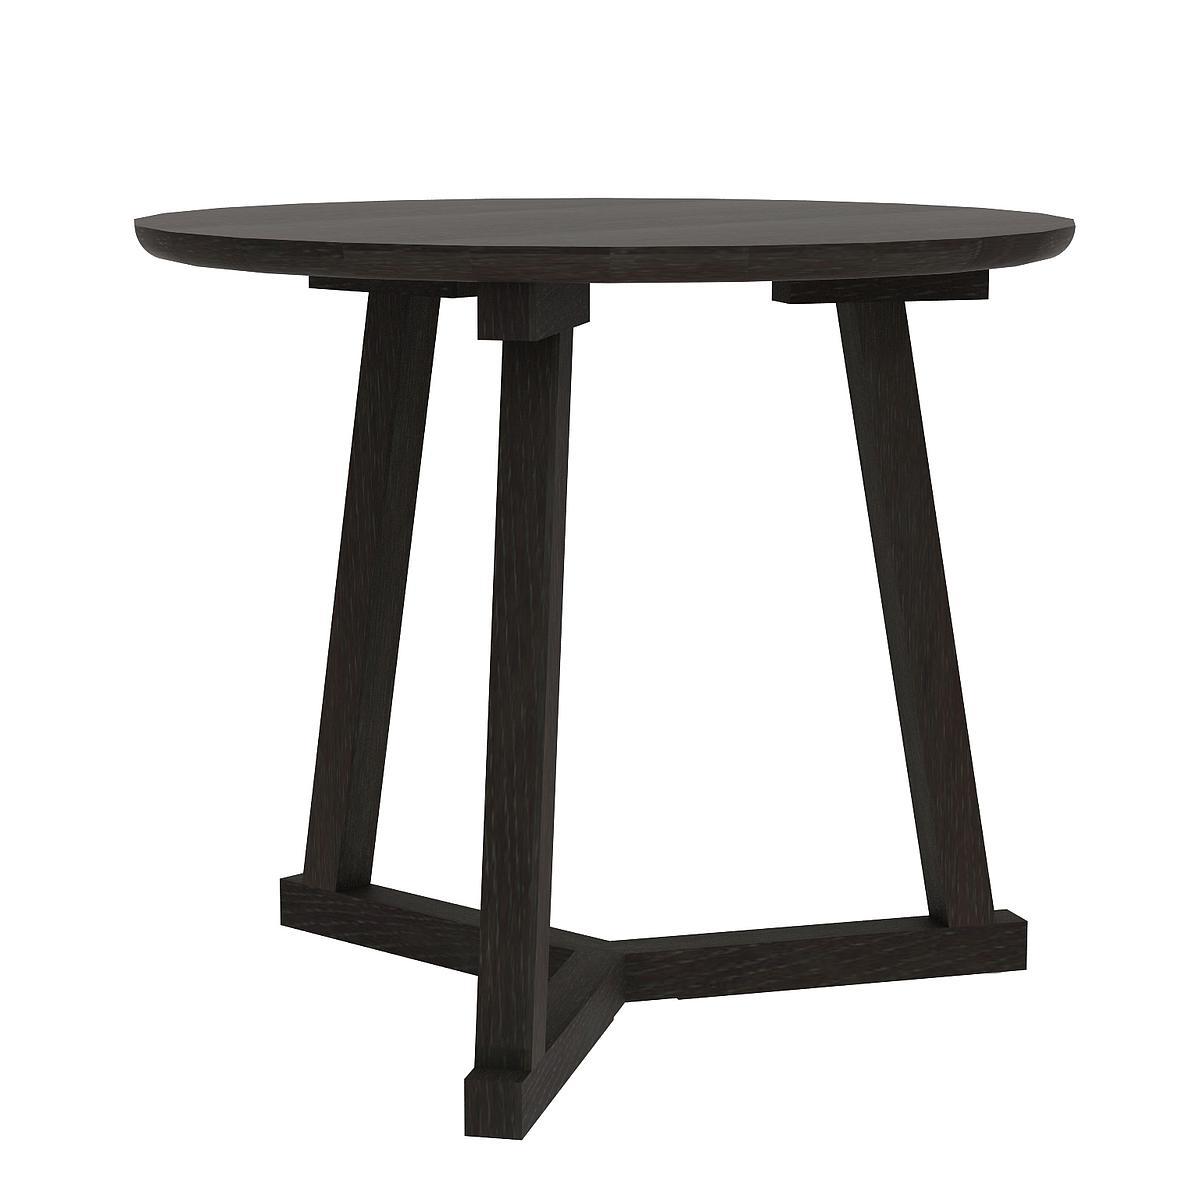 Table d'appoint TRIPOD Ethnicraft 70x70 noir